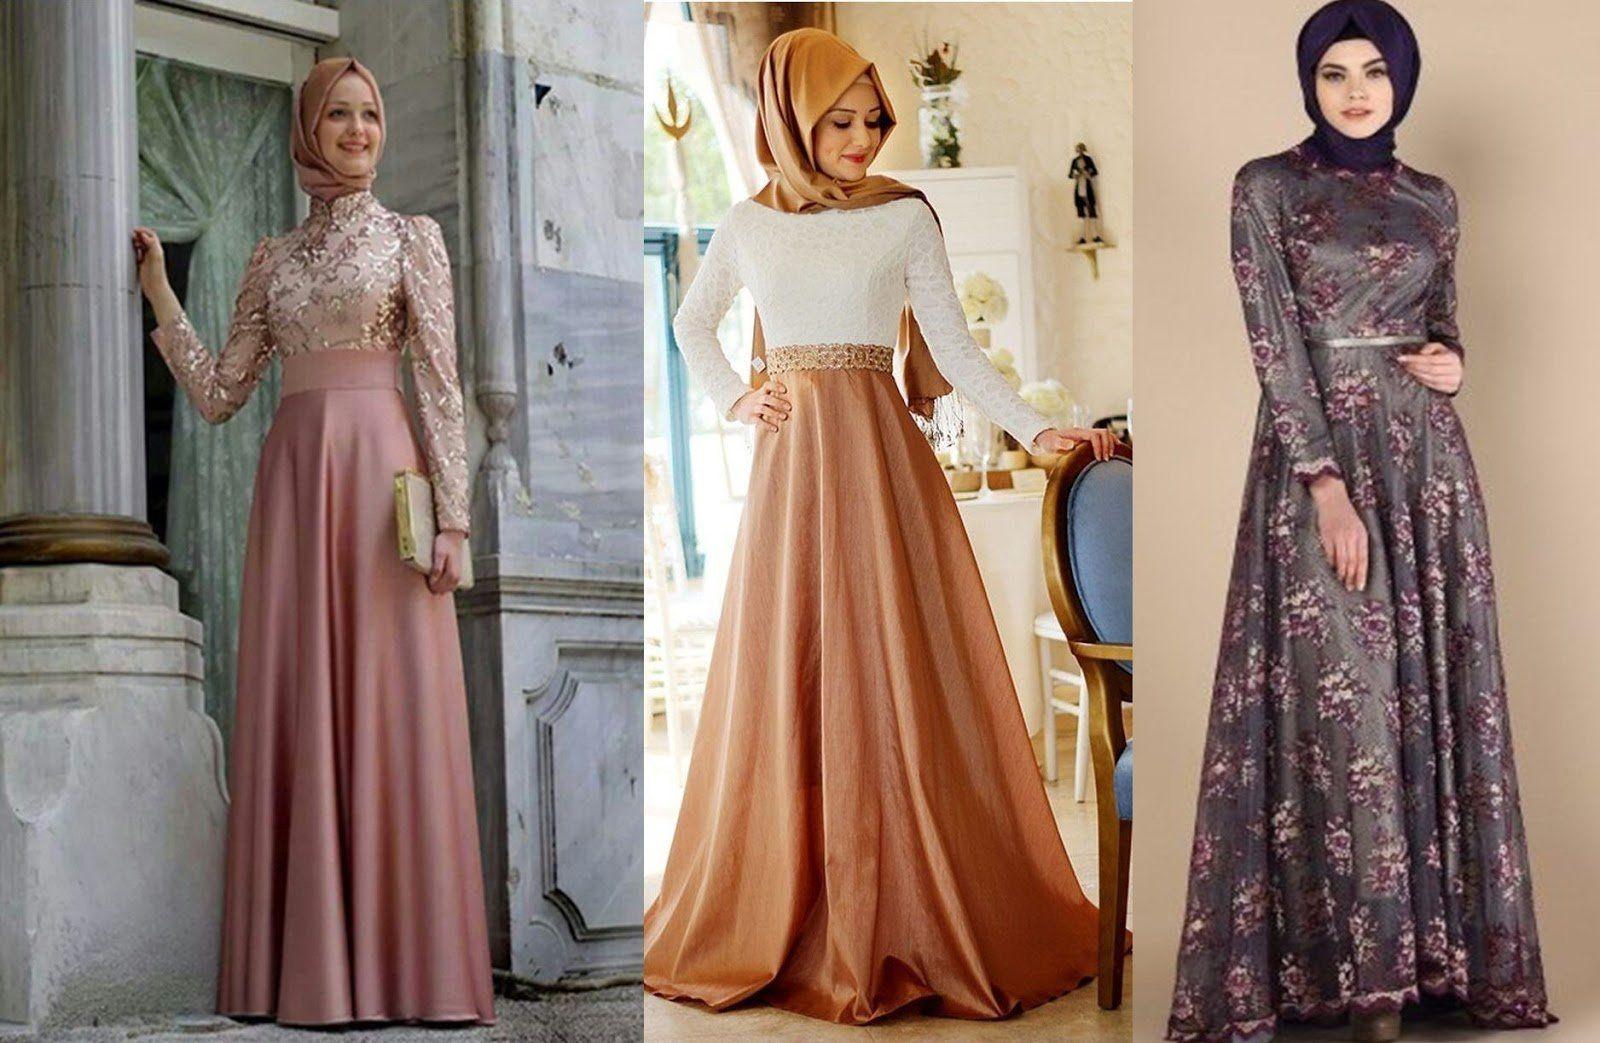 فساتين تركية للمحجبات اجمل فساتين محجبات تركية للخروج موضة 2020 Fashion Formal Dresses Long Dresses